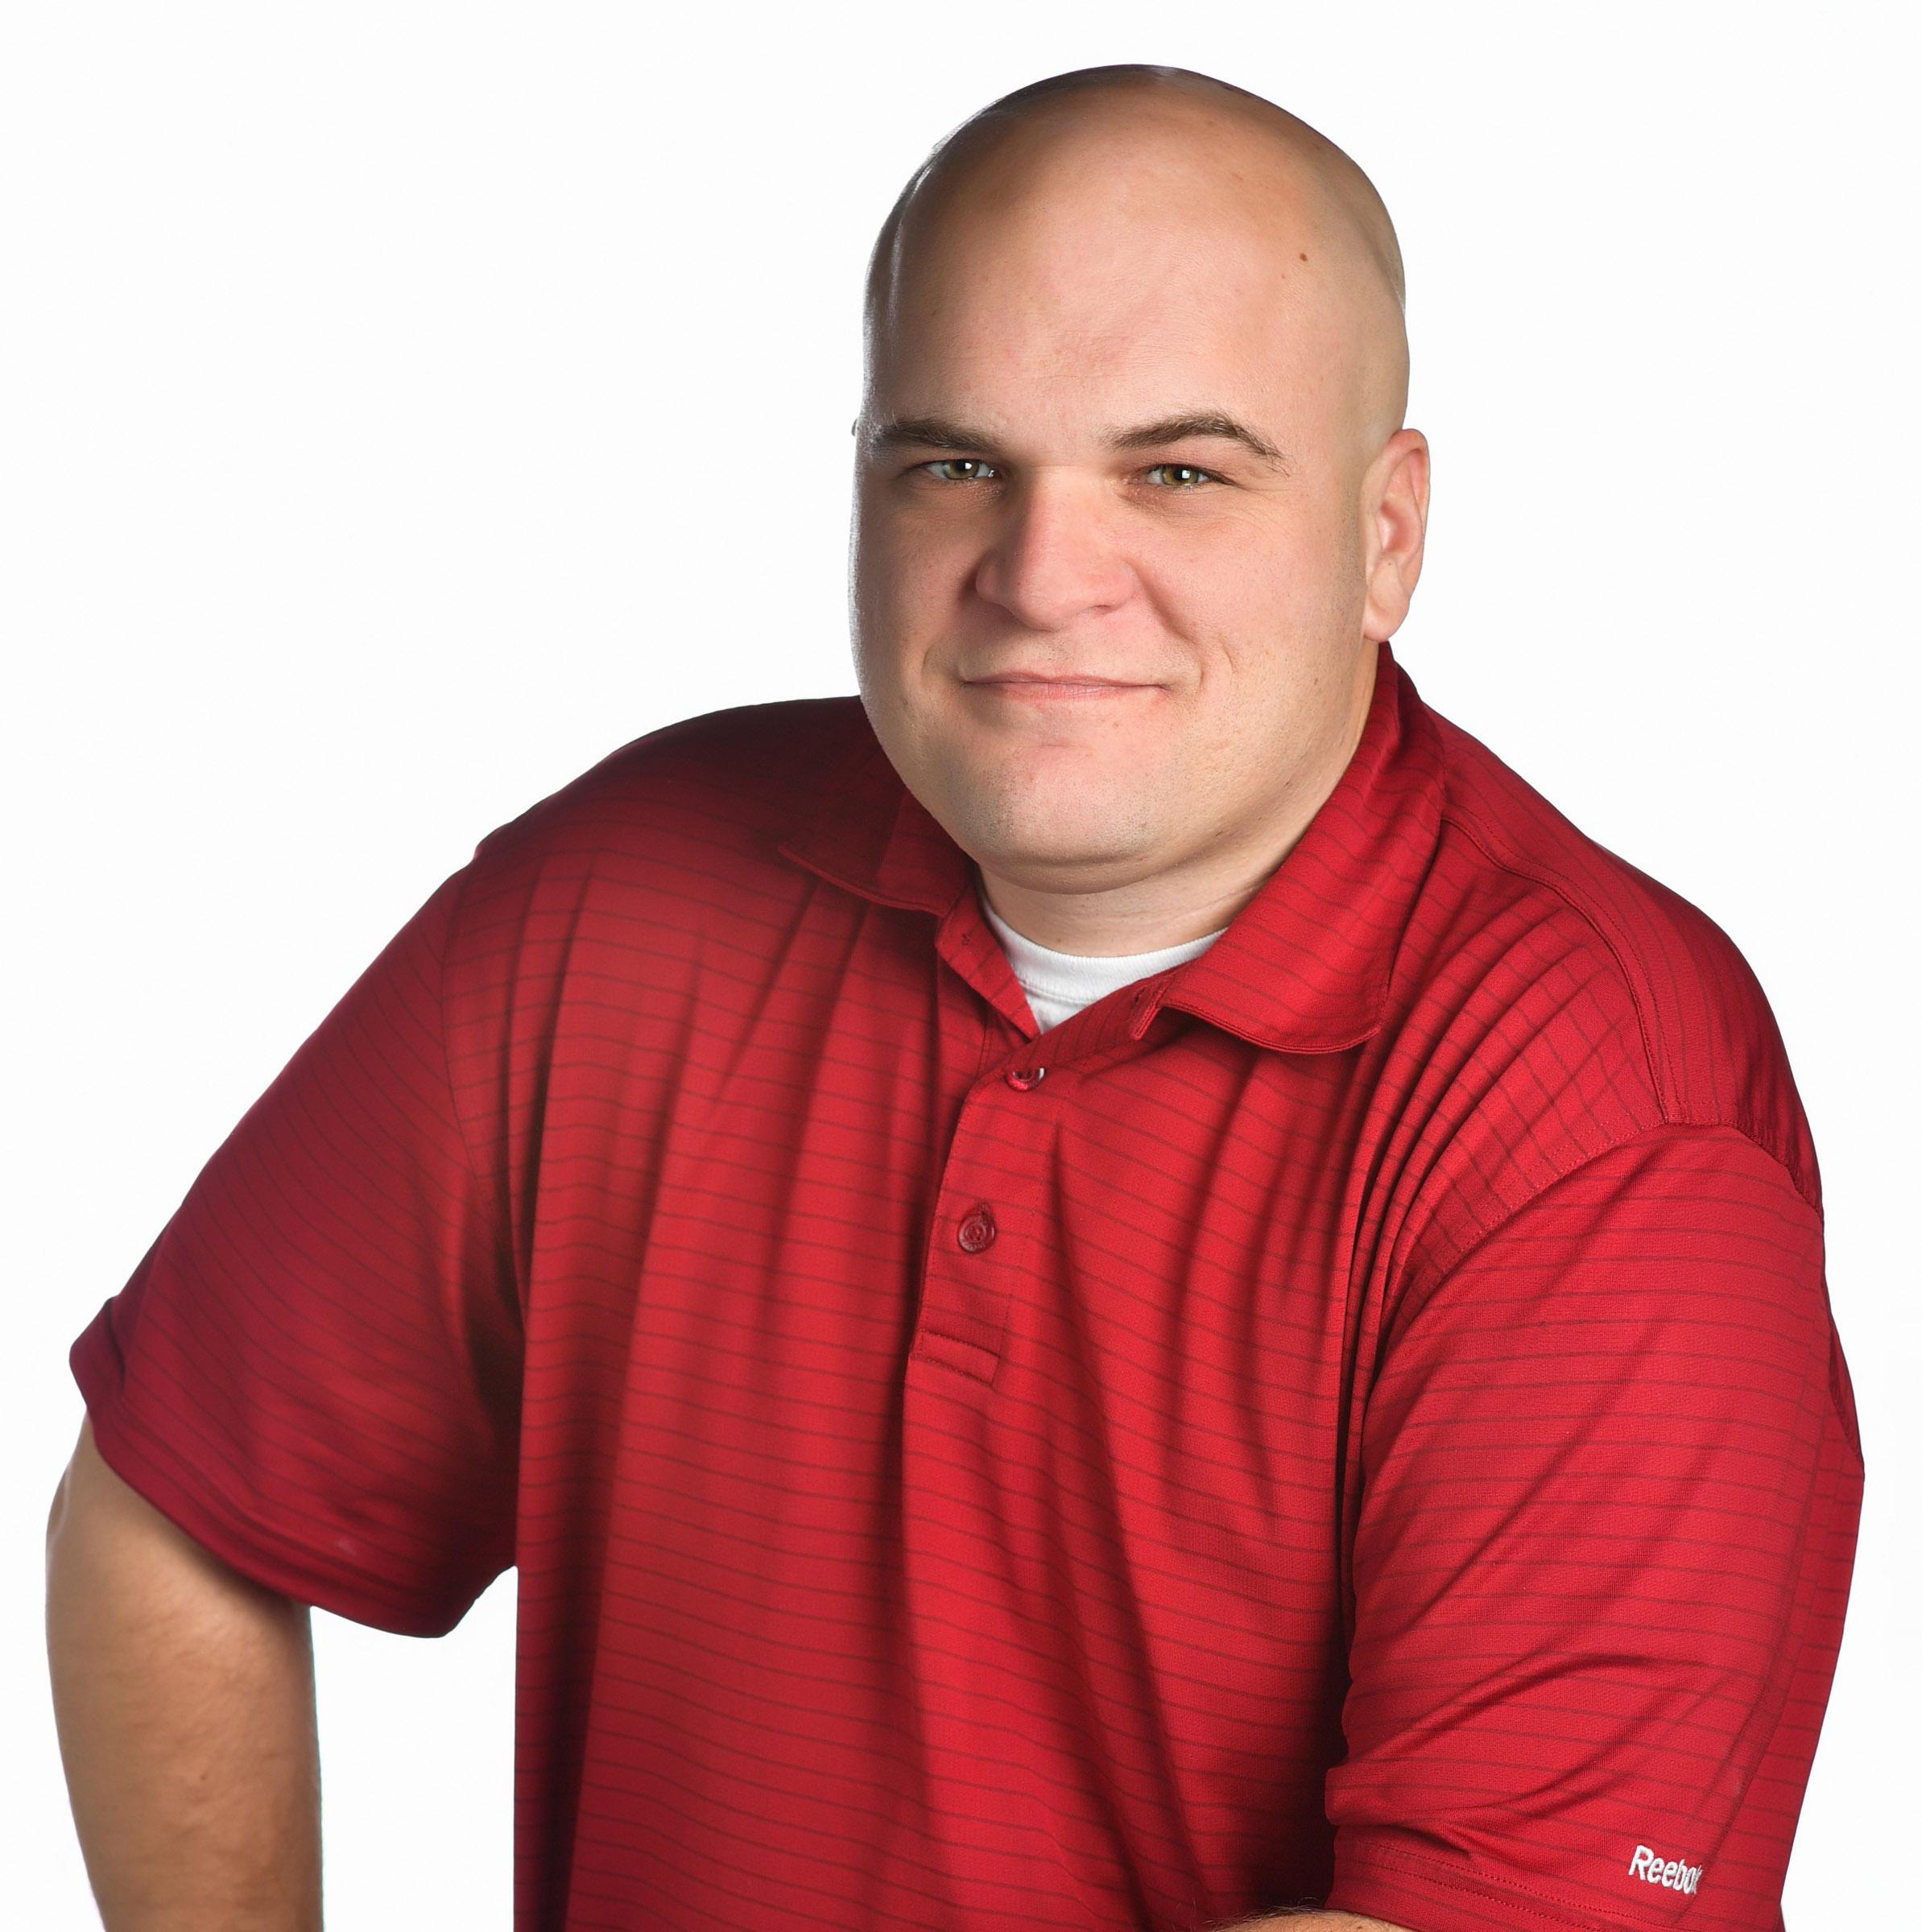 Brandon Townsend